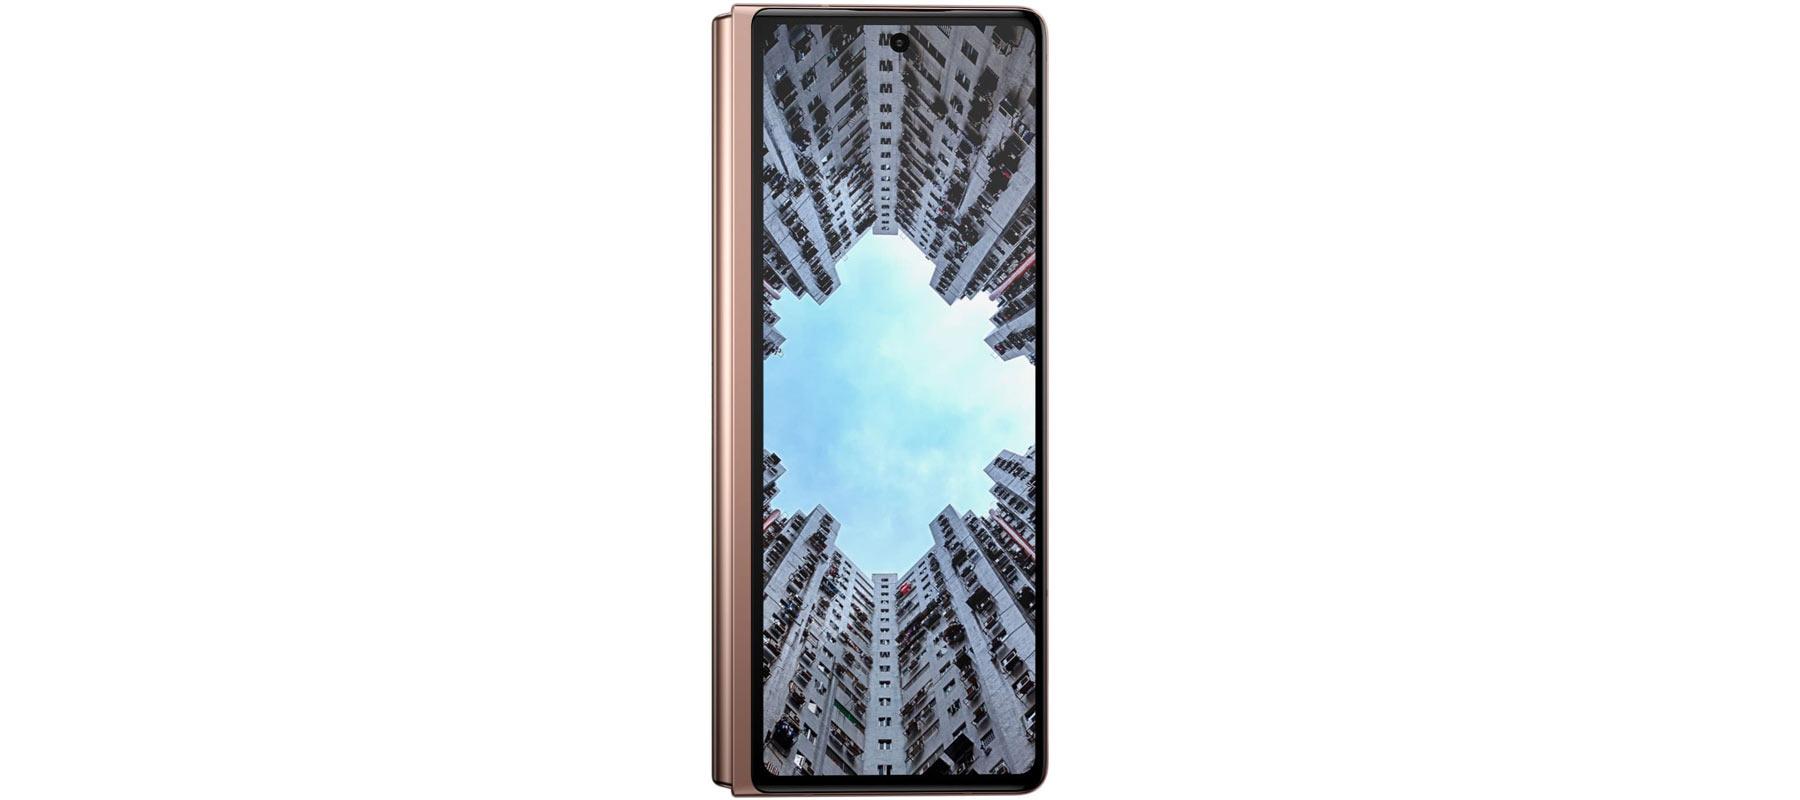 نمایشگر گوشی سامسونگ Galaxy Z Fold2 5G